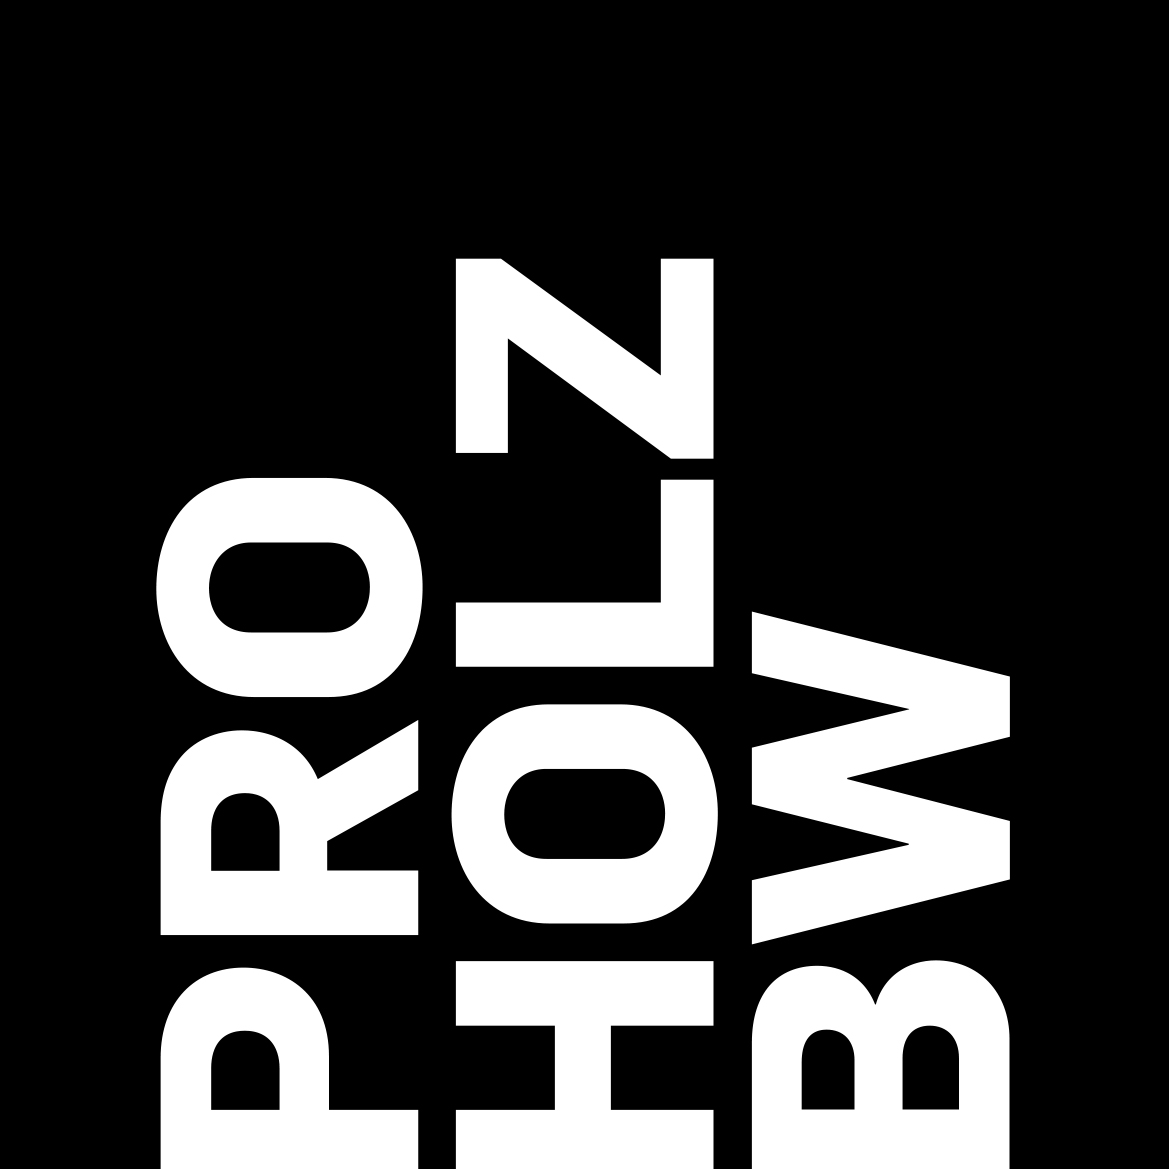 PHB_11492_logo_schwarz